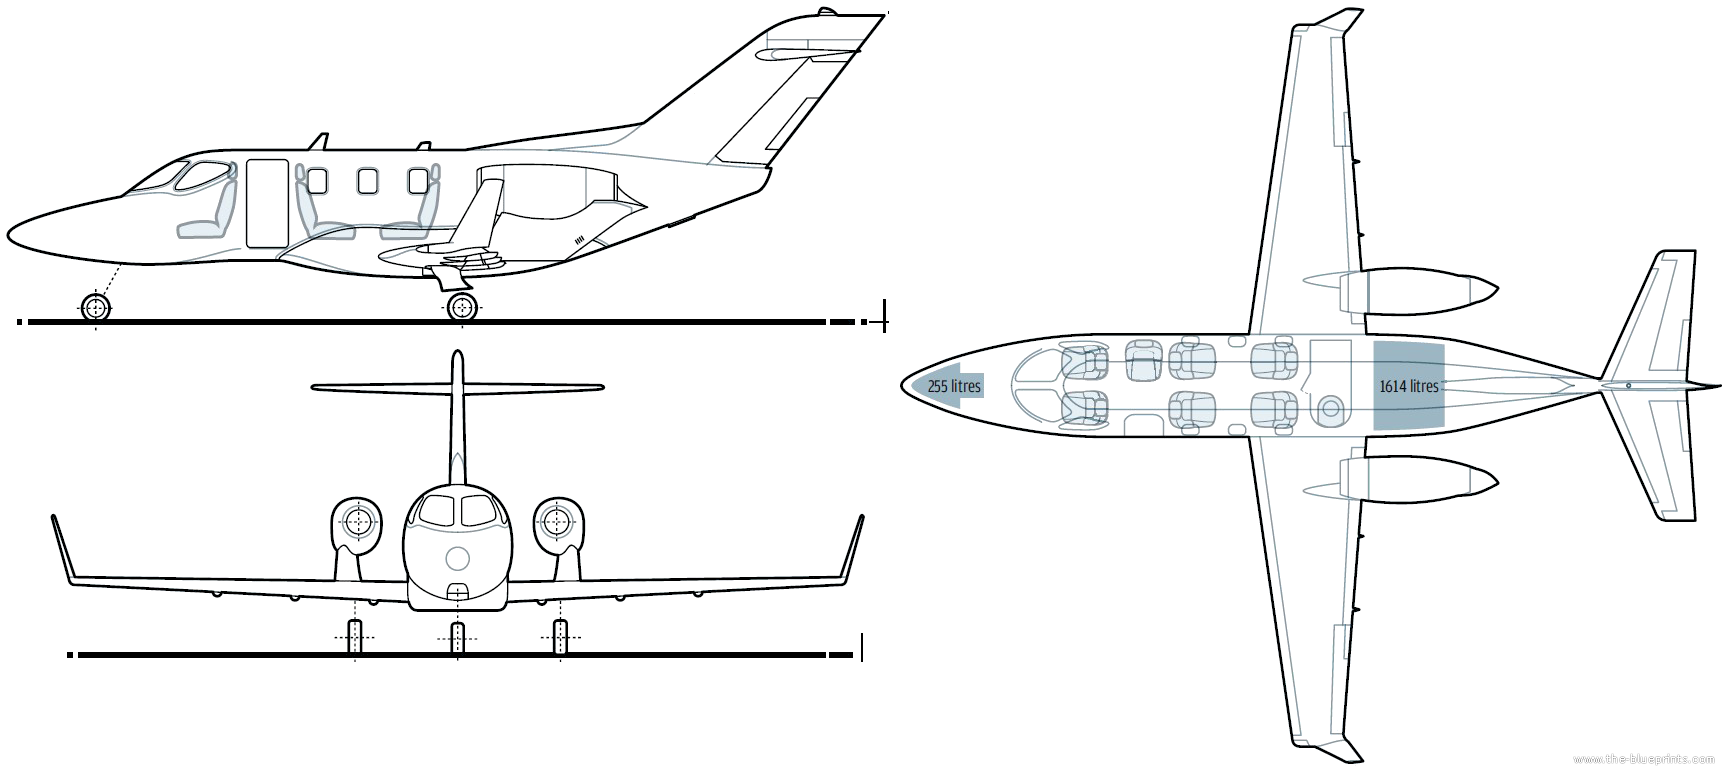 Home Design Blueprints Free Blueprints Gt Modern Airplanes Gt Modern H Gt Hondajet